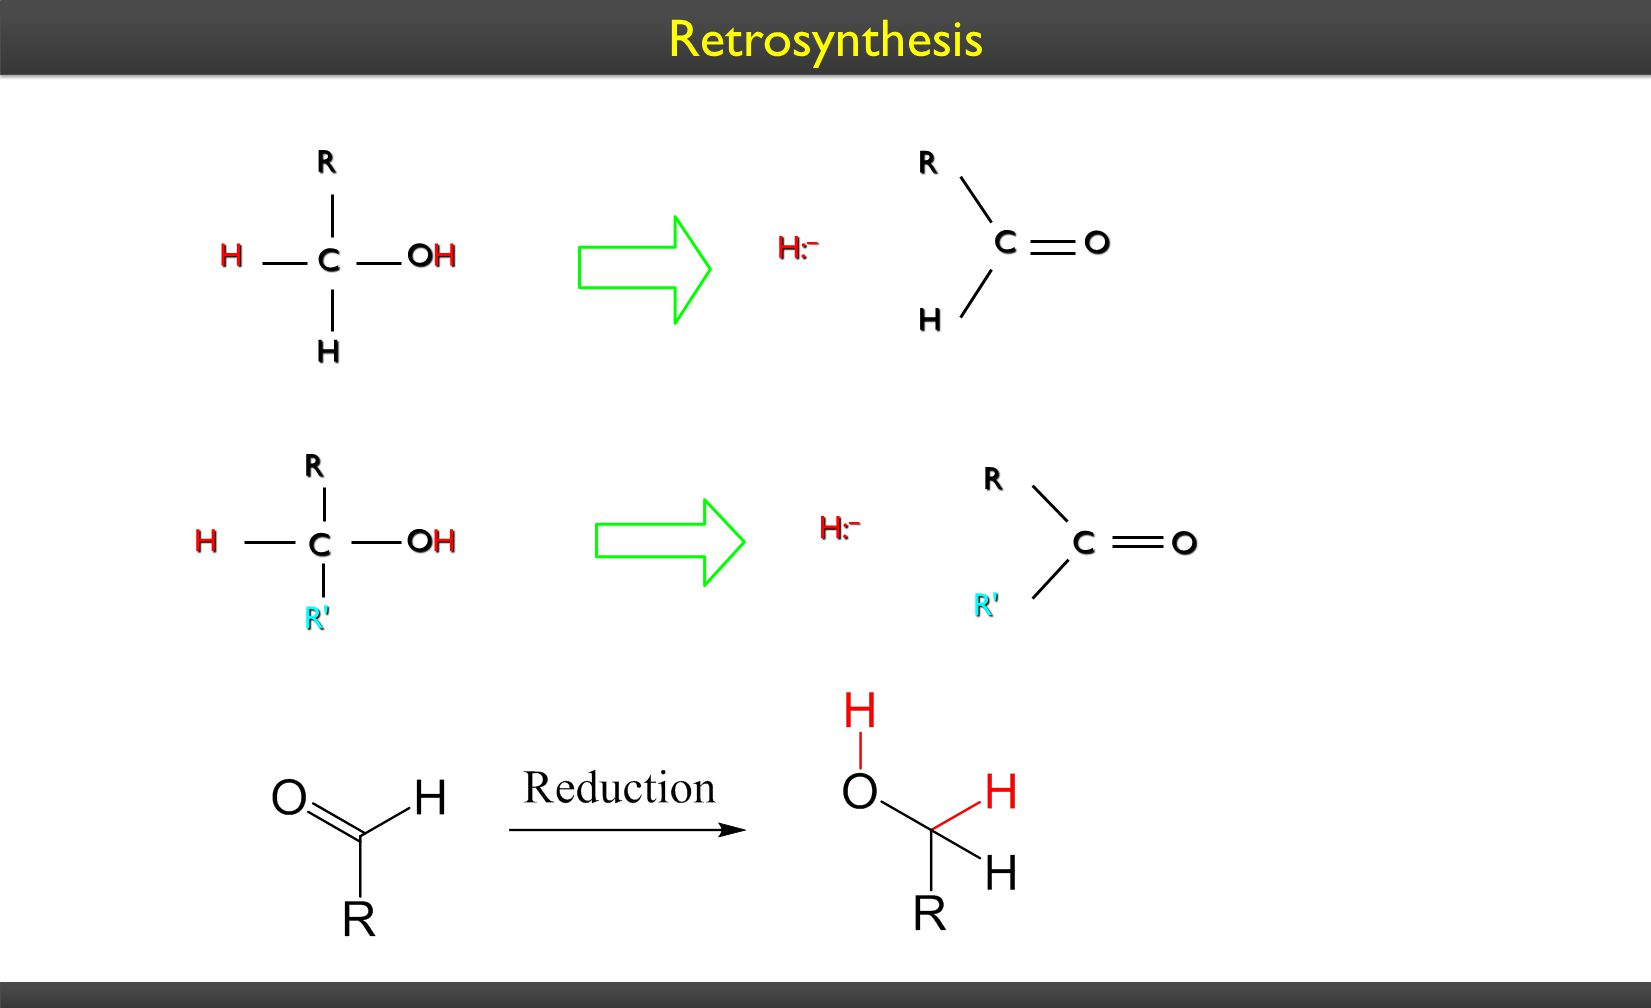 Retrosynthesis H: – CRH OHOHOHOH H C R H O CRH OHOHOHOH R' C R R' O